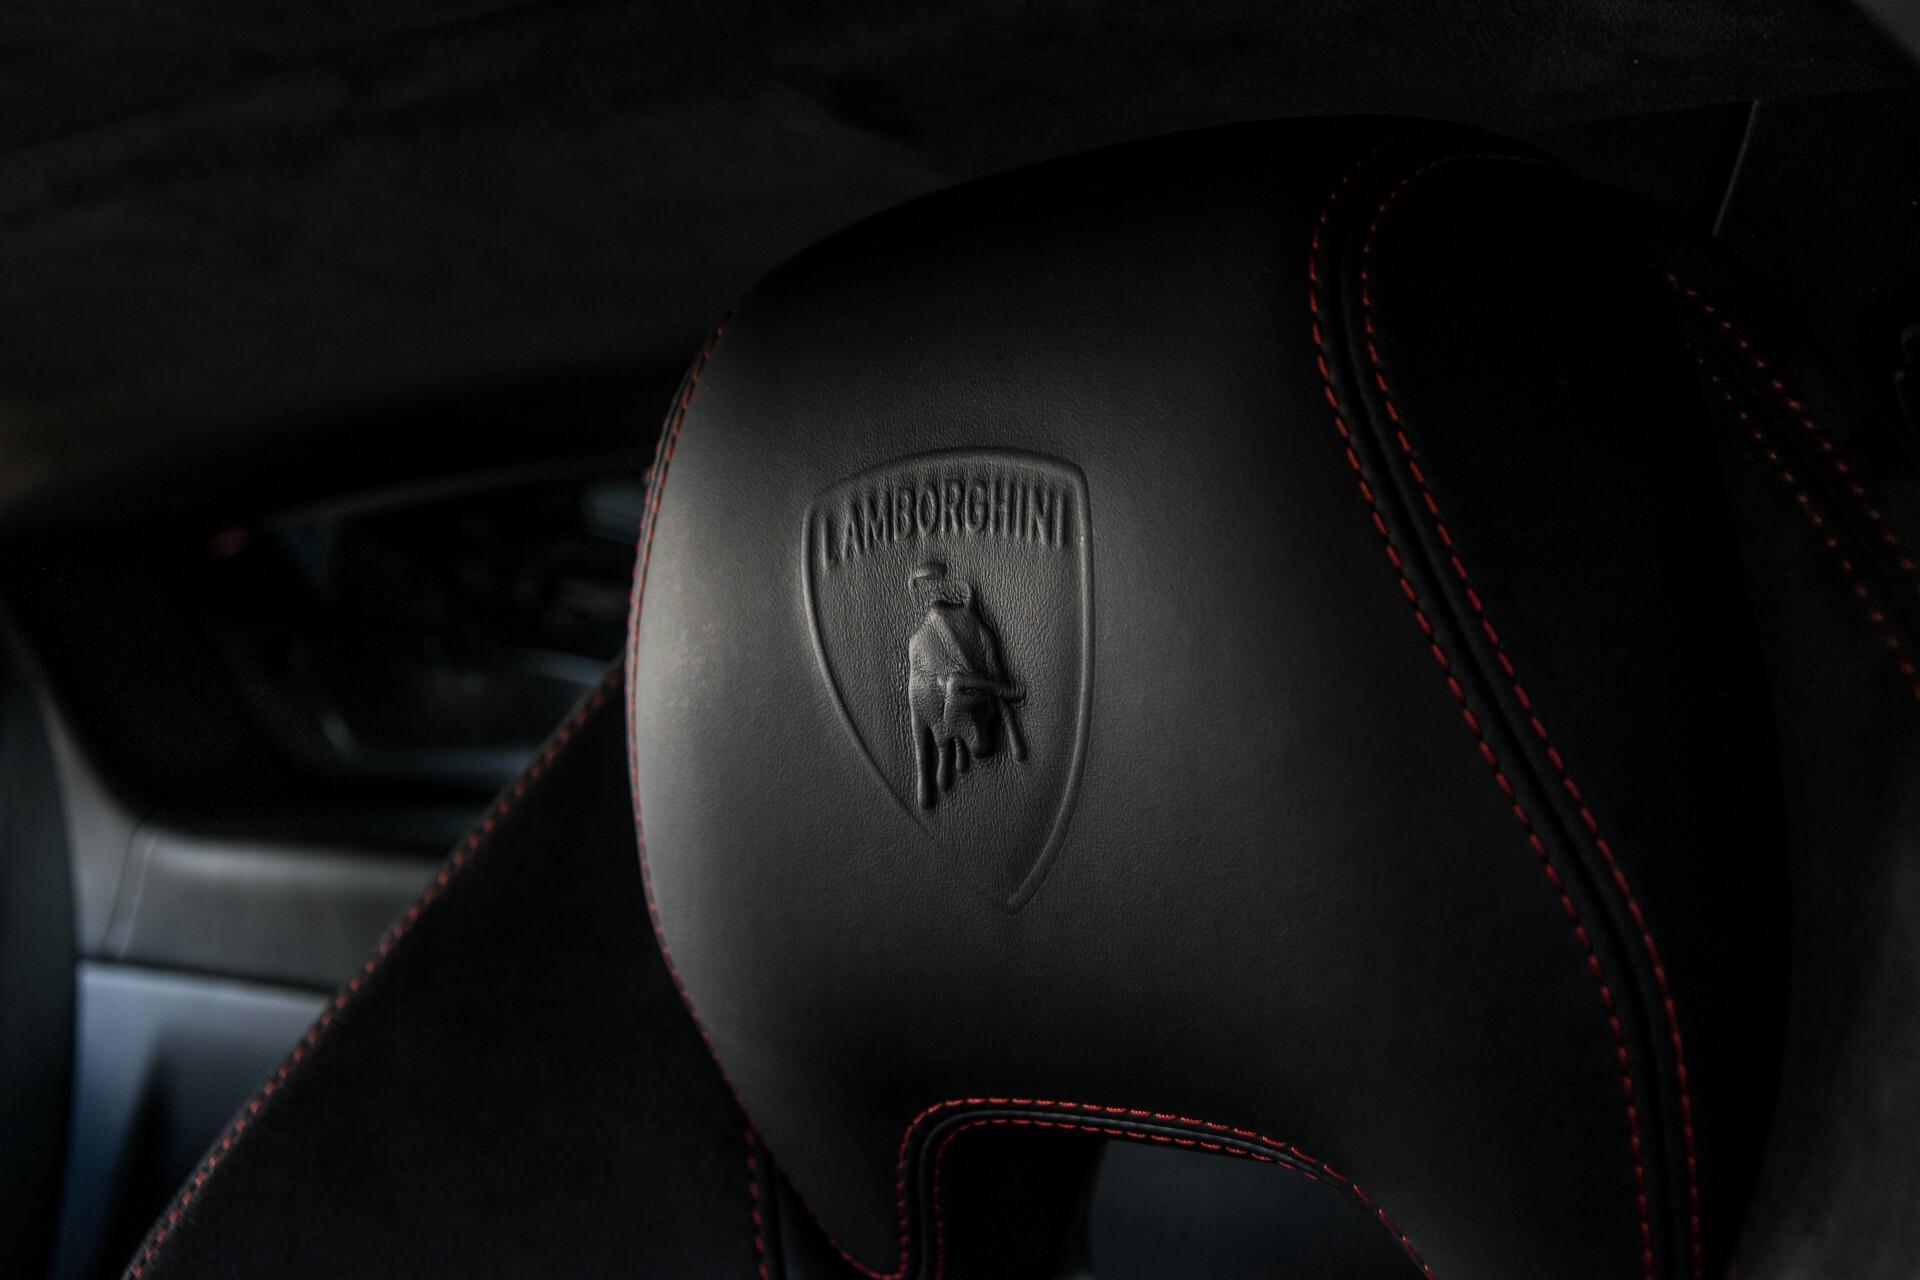 Lamborghini Huracan 5.2 V10 LP610-4 Aeropackage Heffner Performance Aut7 Foto 24